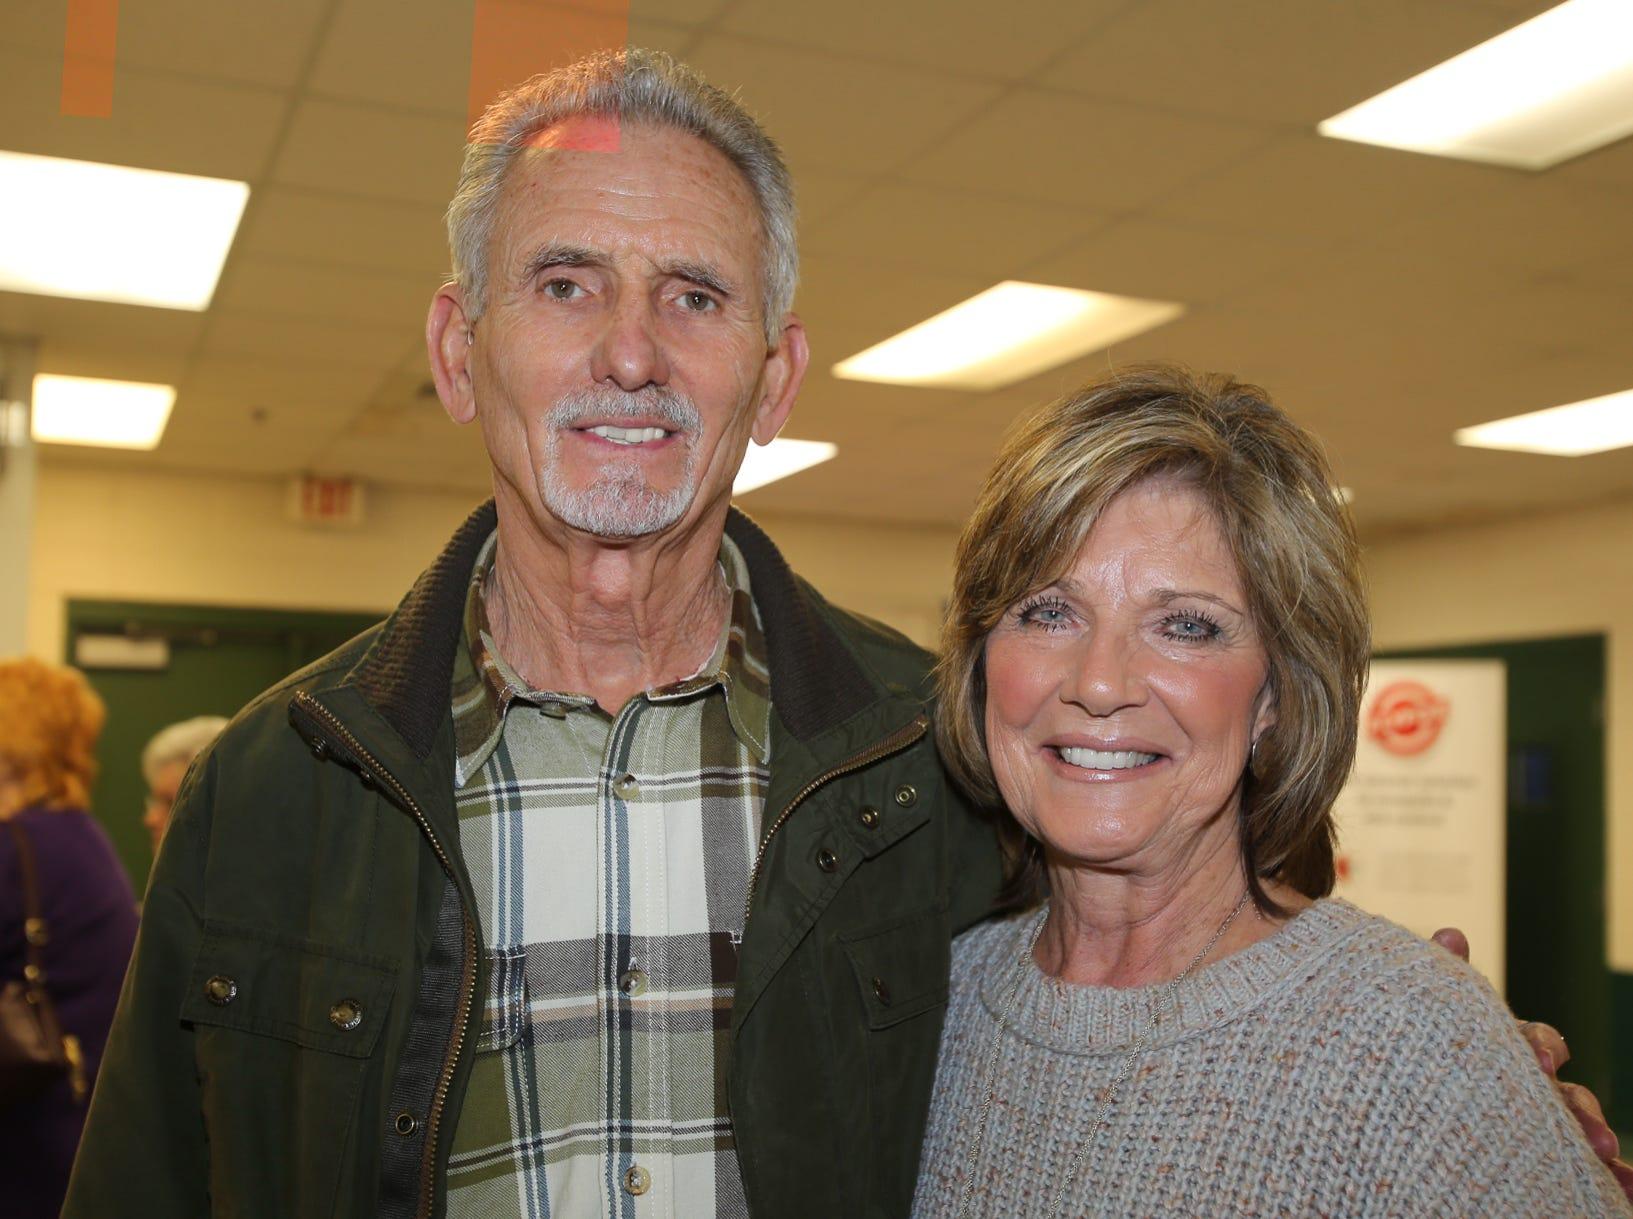 Dan and Karen Rhodes